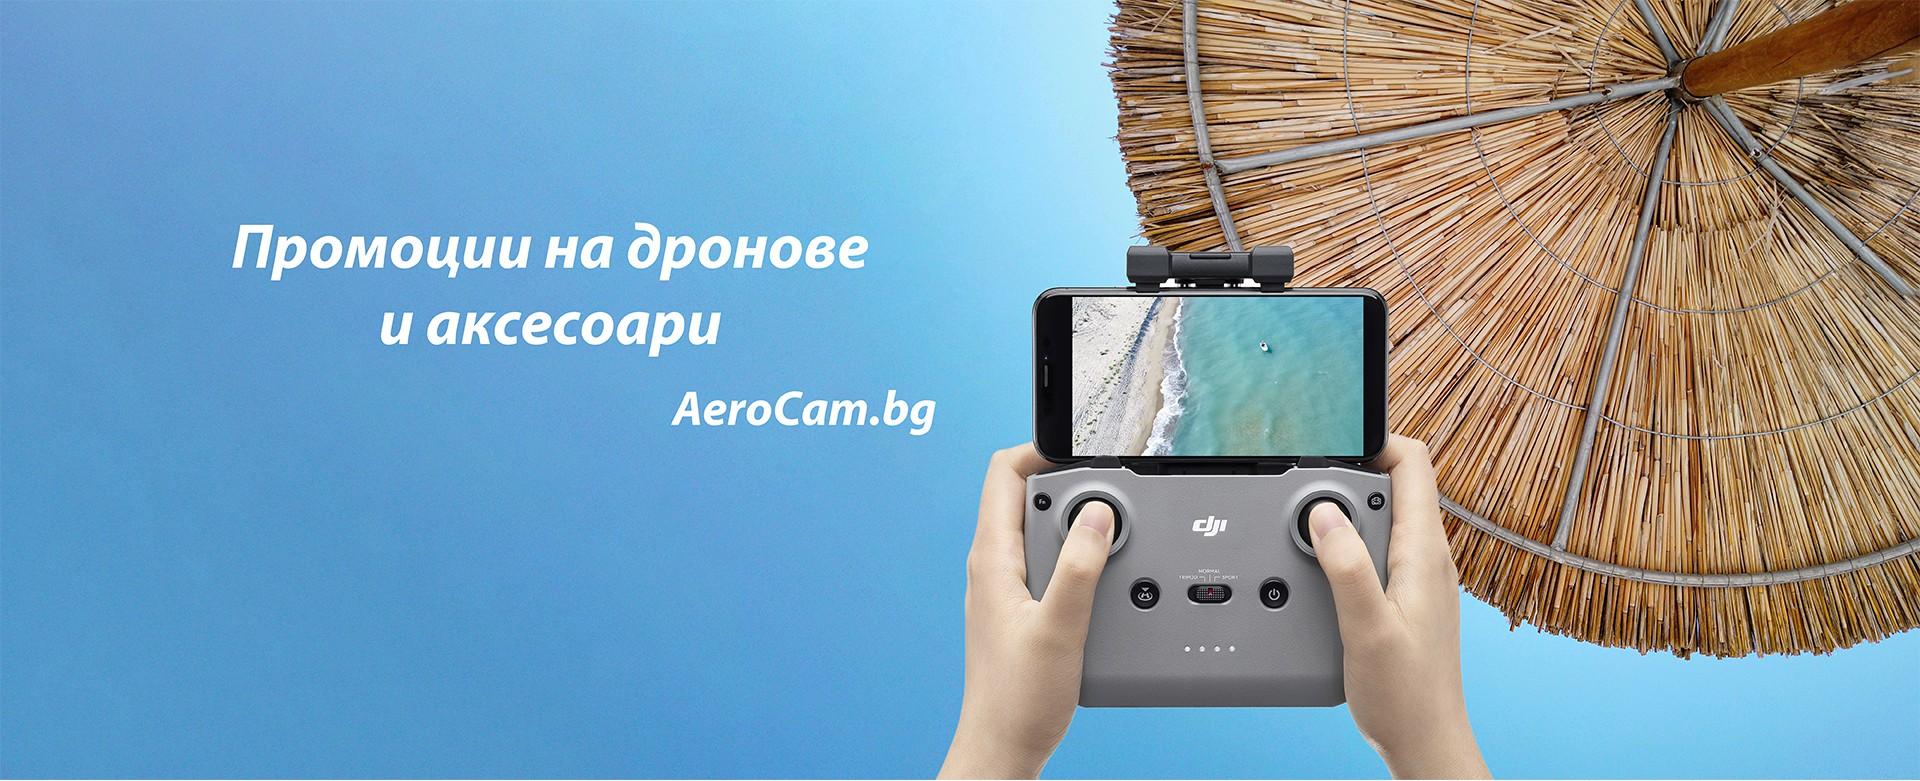 Drone Promo | AeroCam.bg